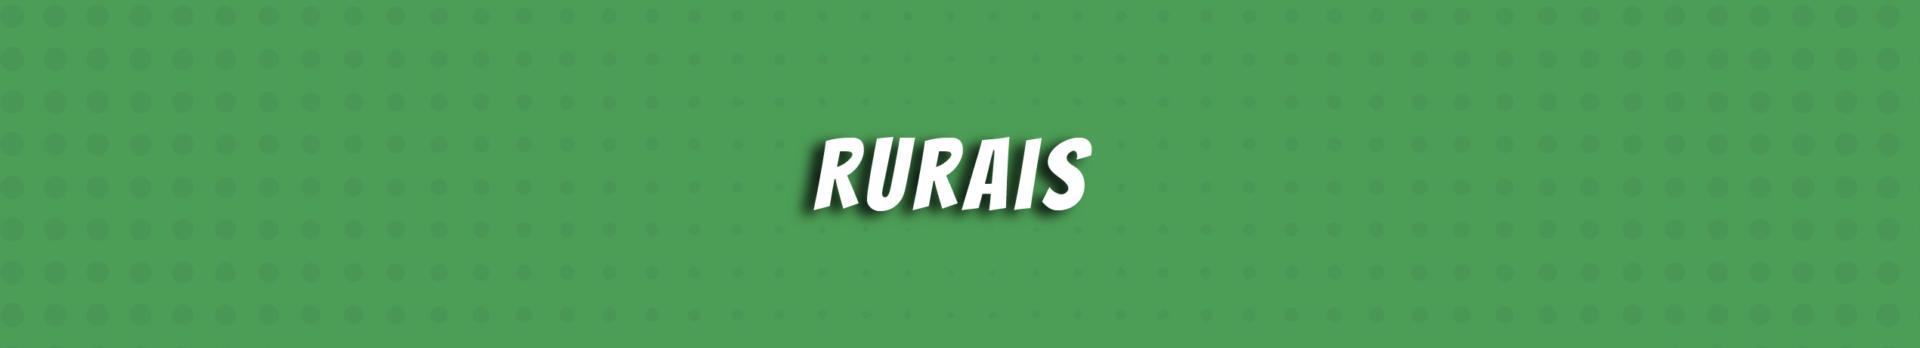 Rurais